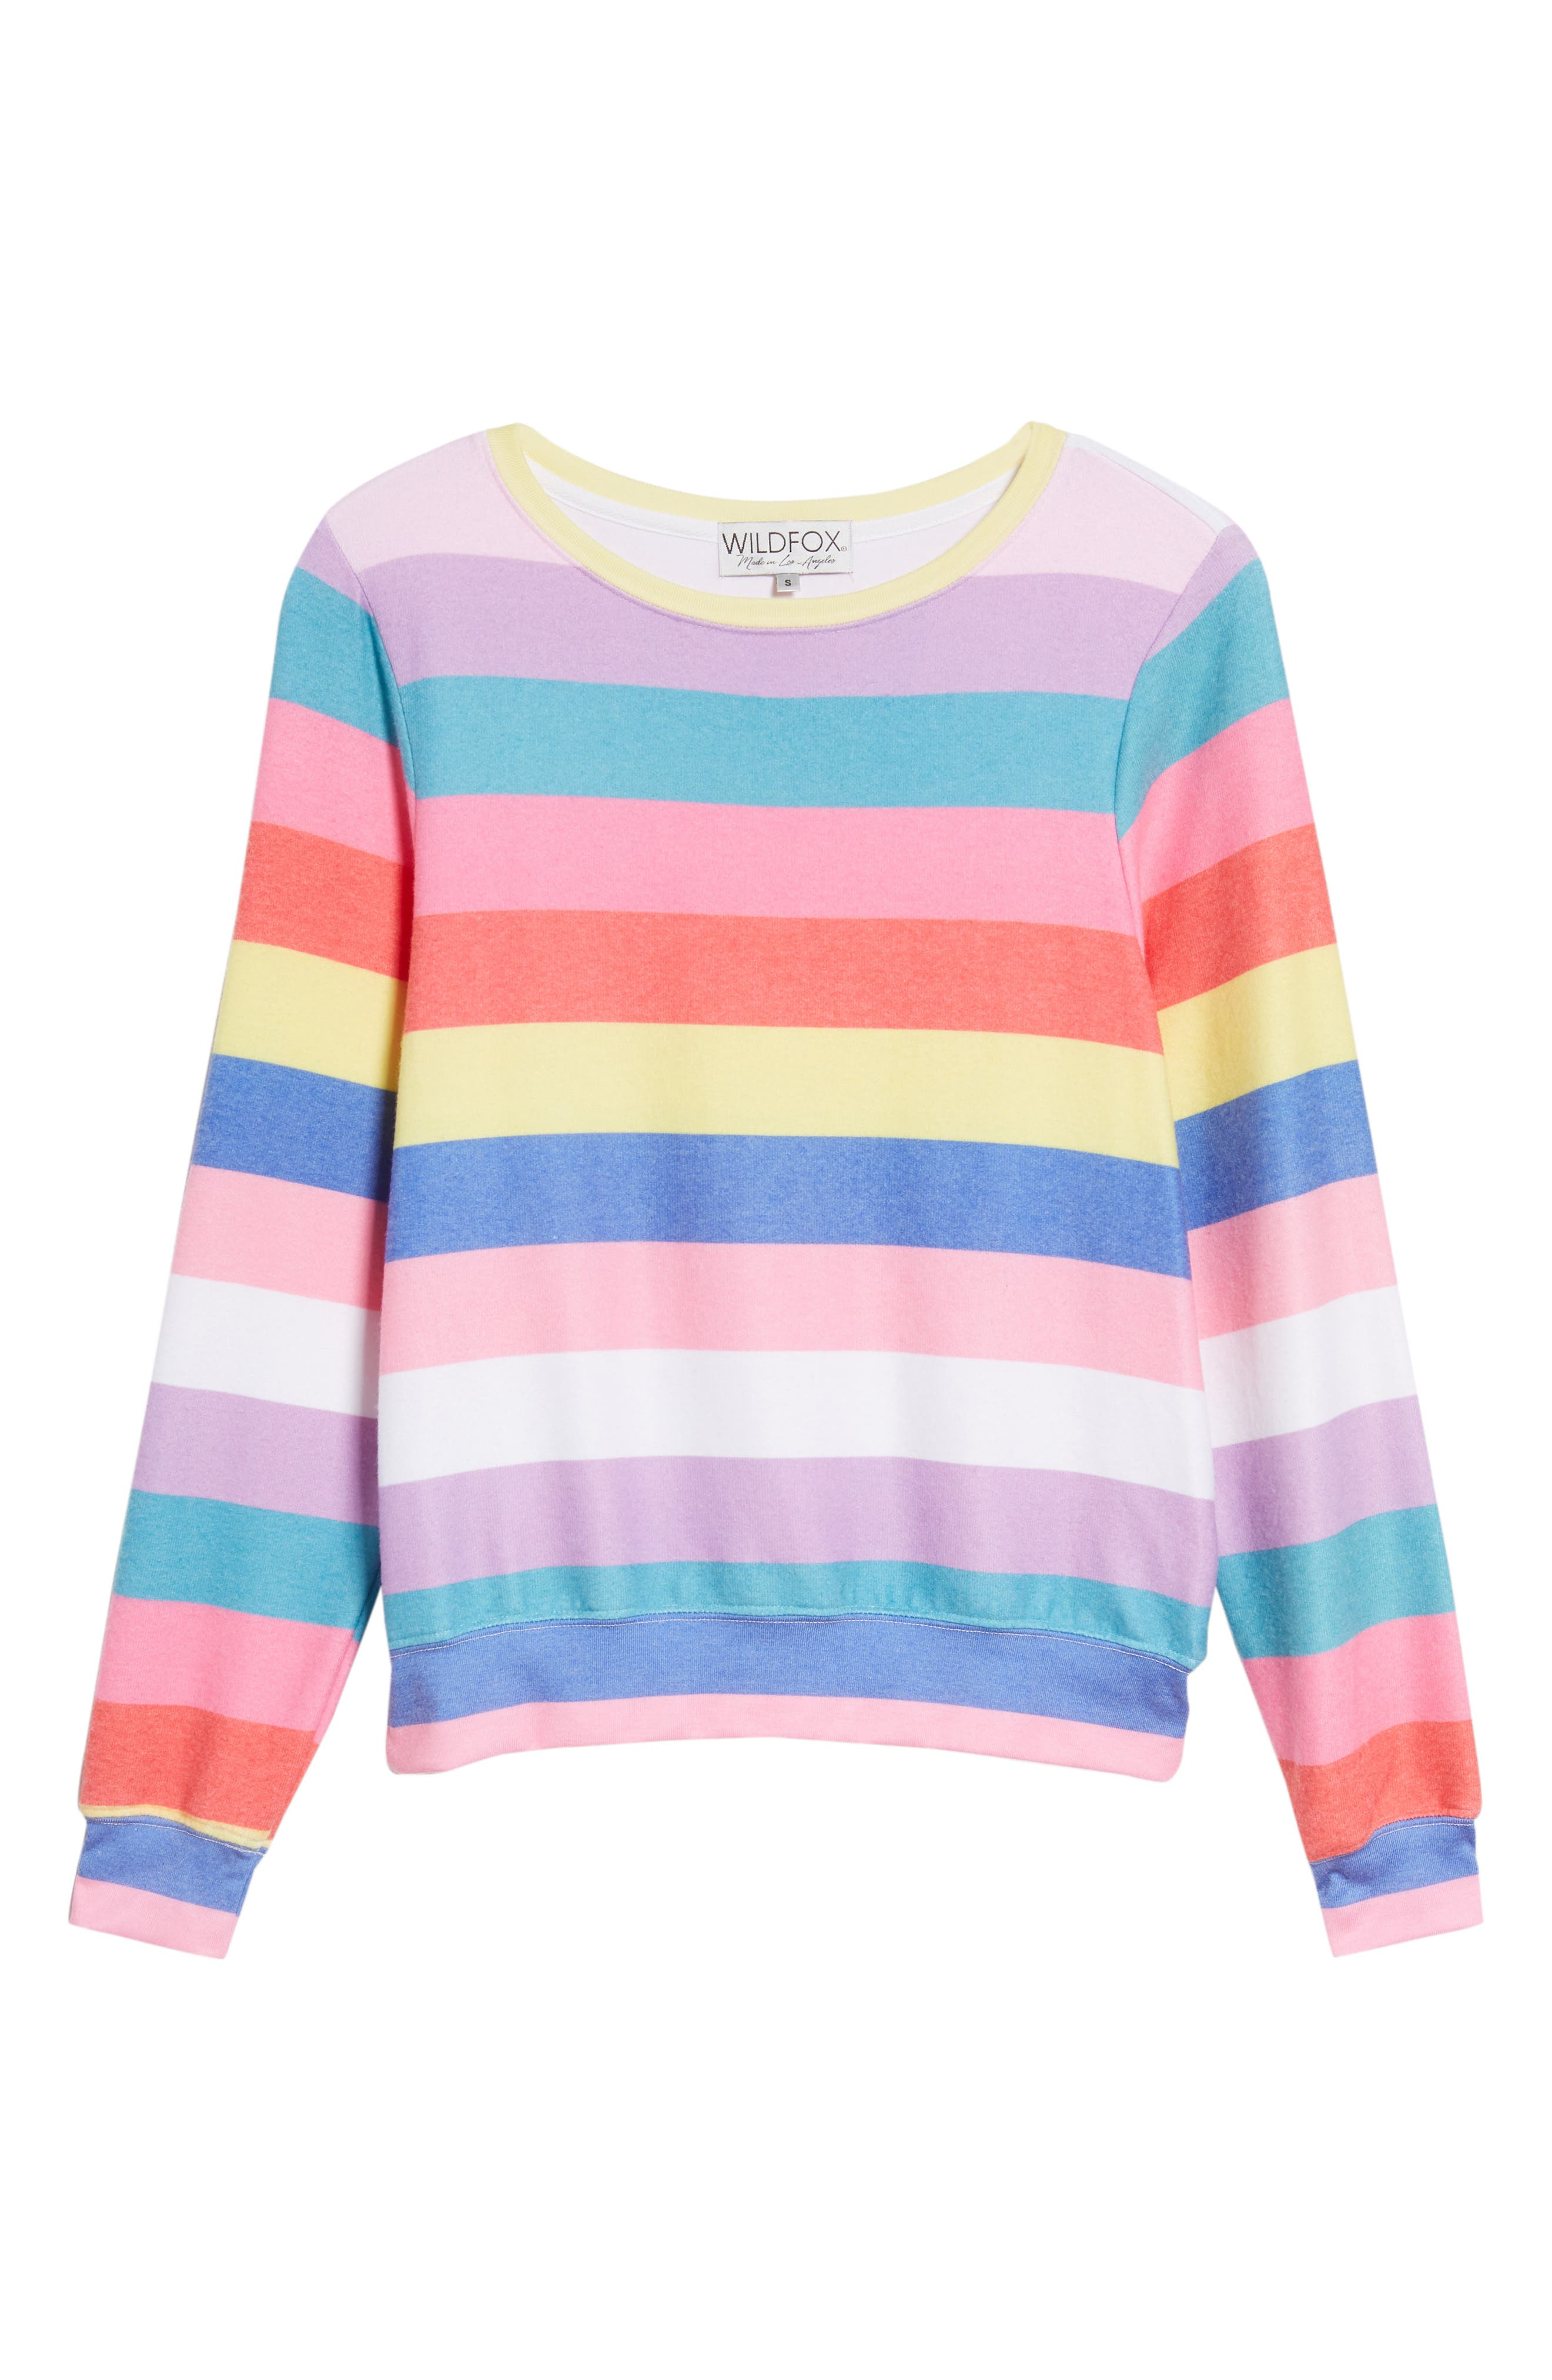 Castaway Roadtrip Sweatshirt,                             Alternate thumbnail 6, color,                             650